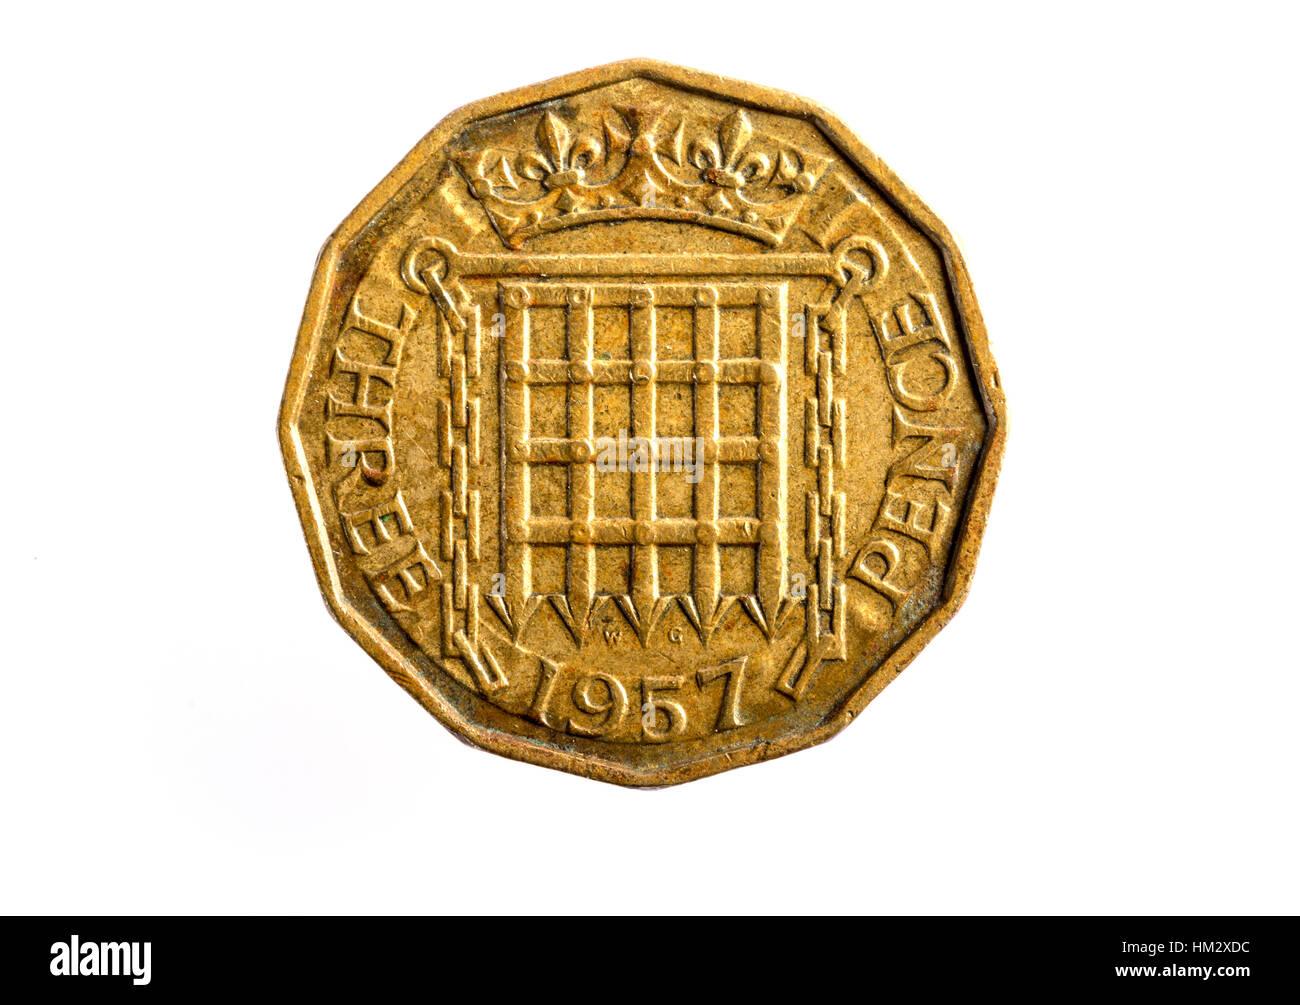 1957 3 peniques de moneda británica imperial Imagen De Stock